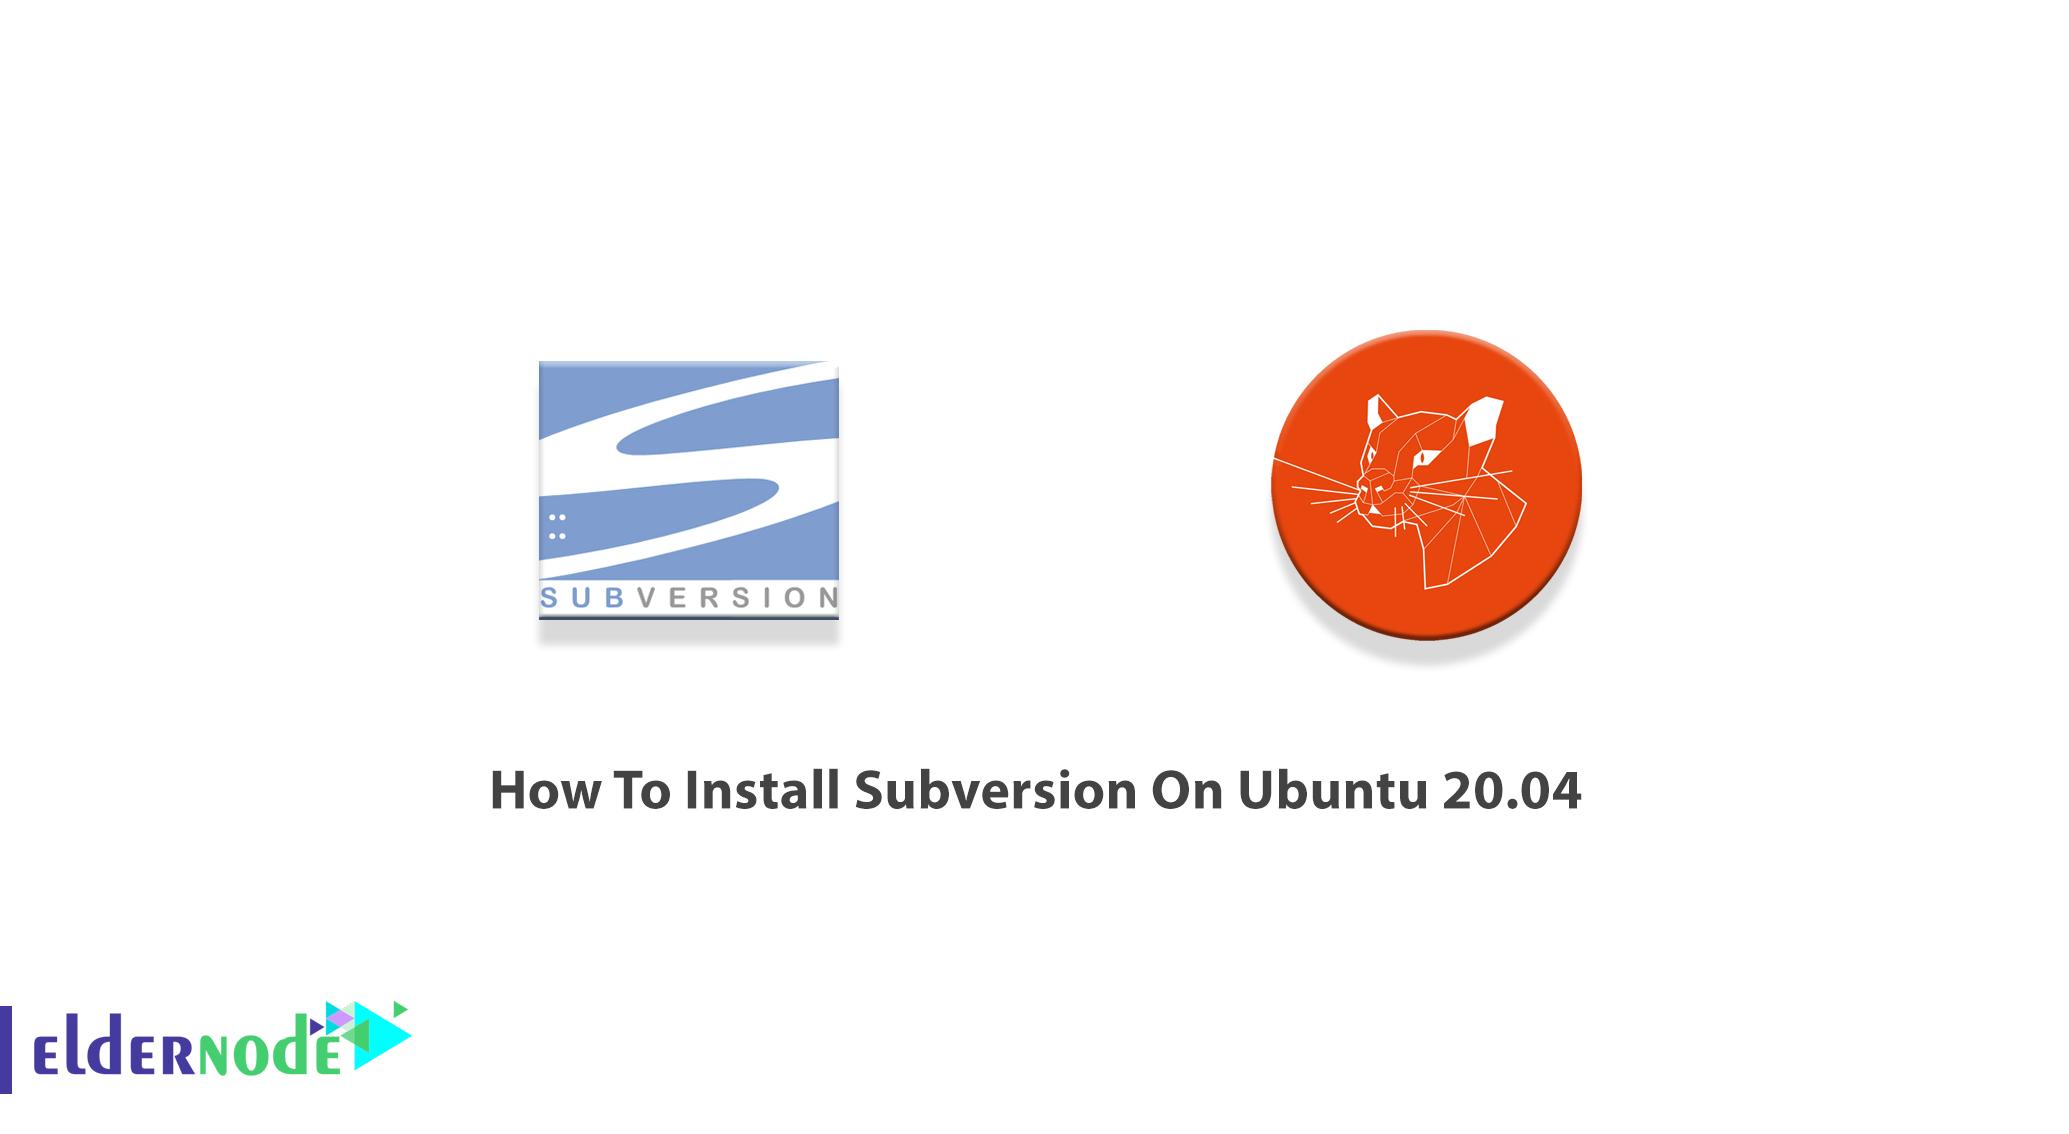 How To Install Subversion On Ubuntu 20.04